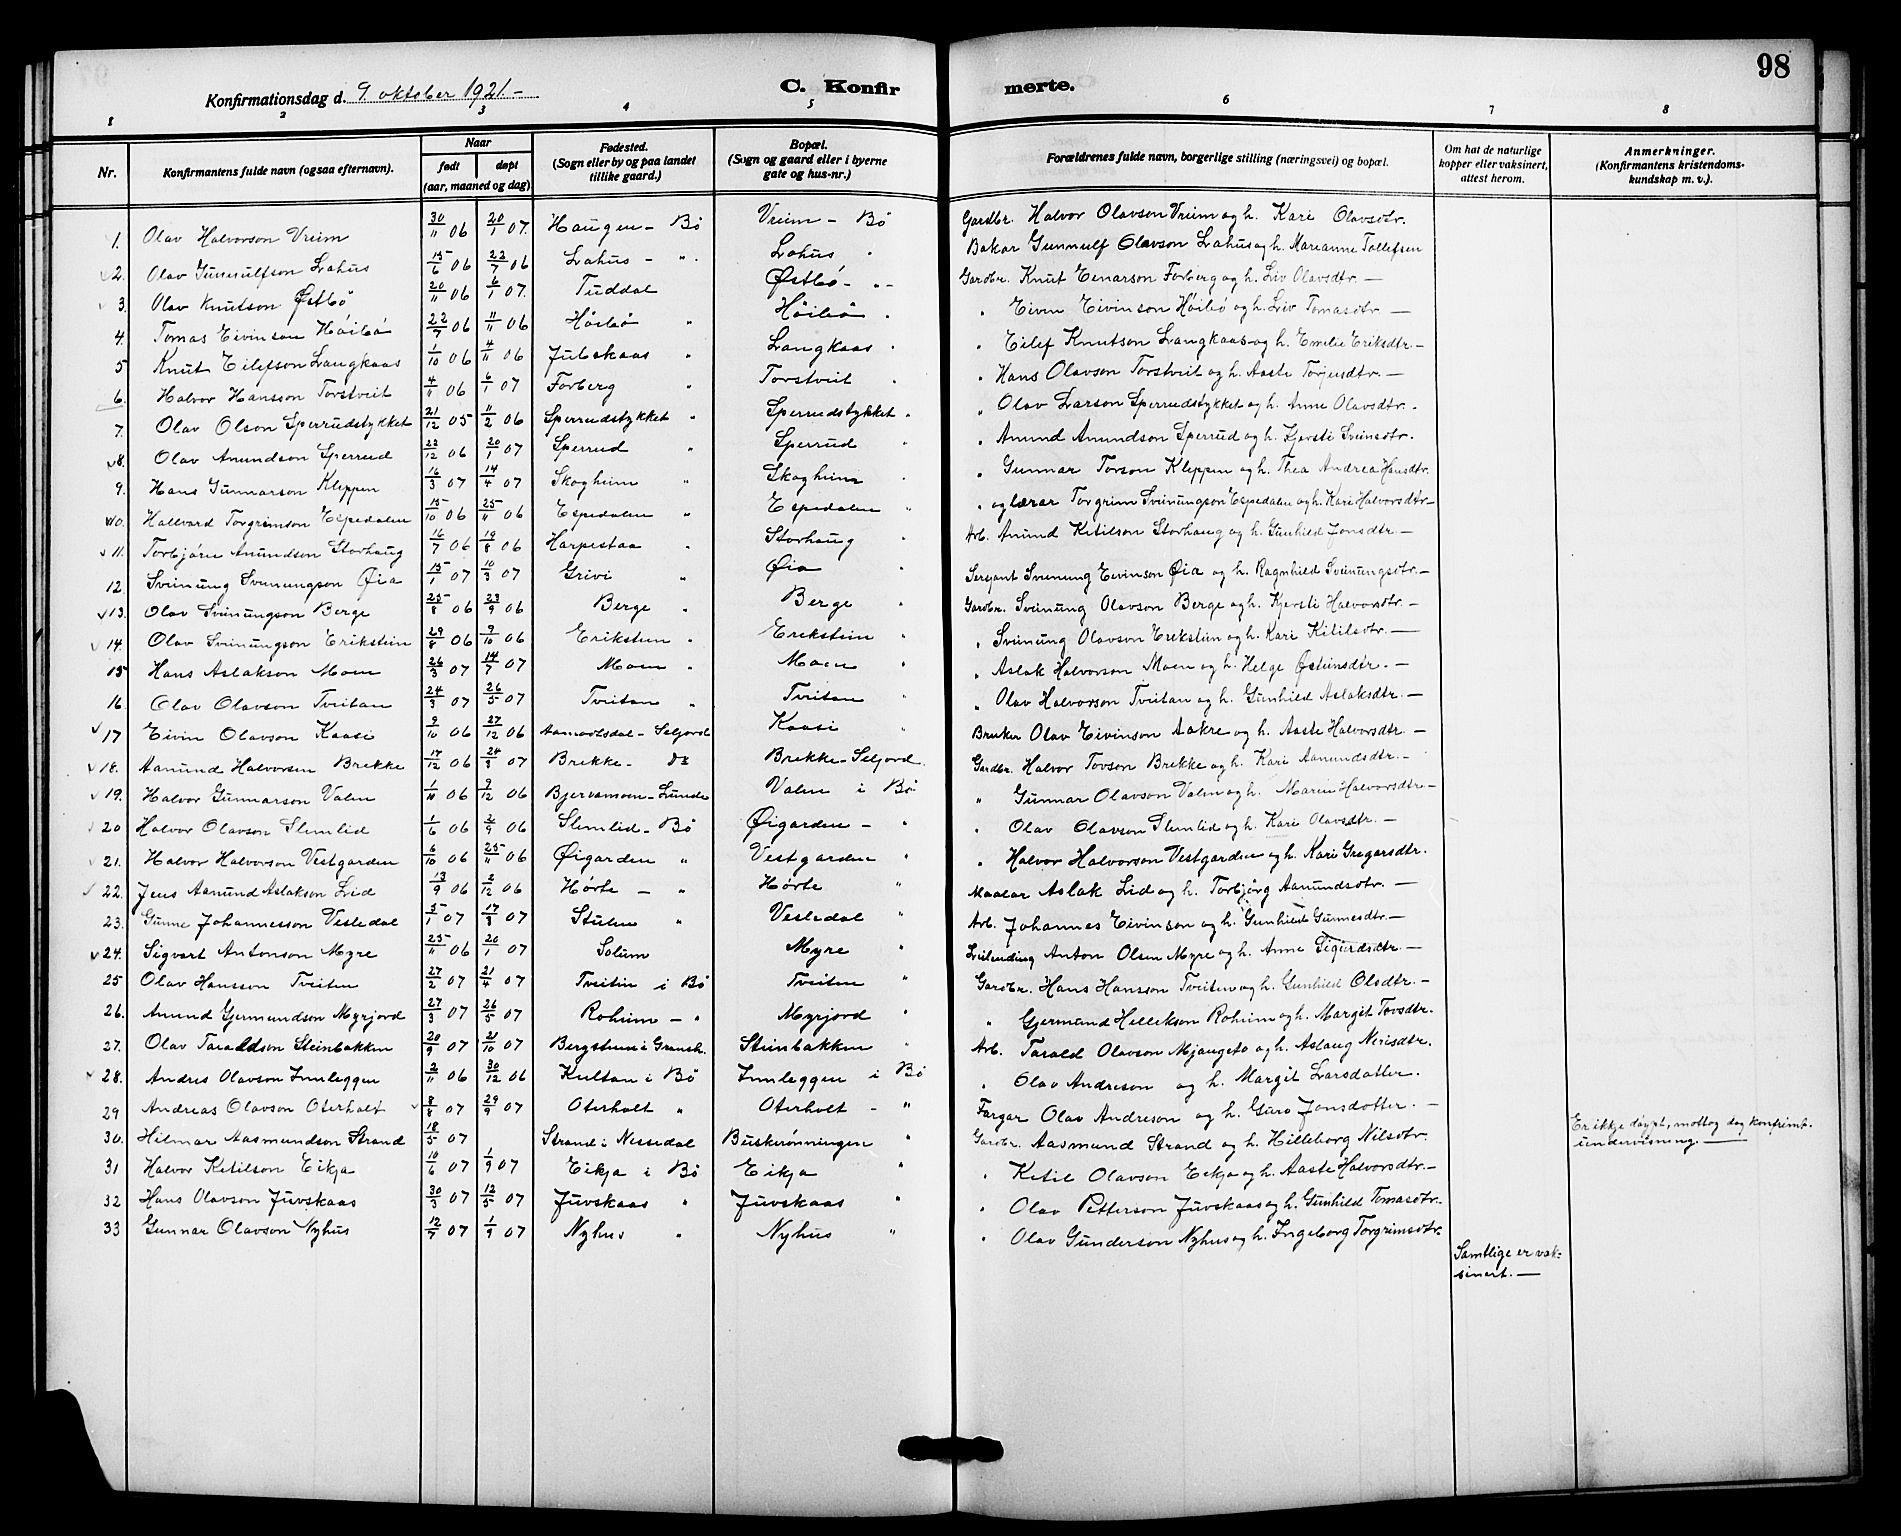 SAKO, Bø kirkebøker, G/Ga/L0007: Klokkerbok nr. 7, 1909-1924, s. 98